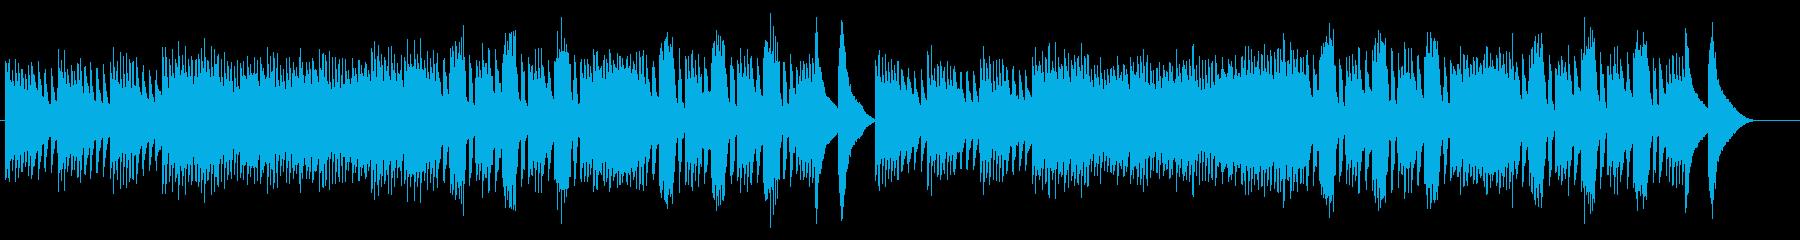 RPG ハープシコード哀愁のバロック 城の再生済みの波形